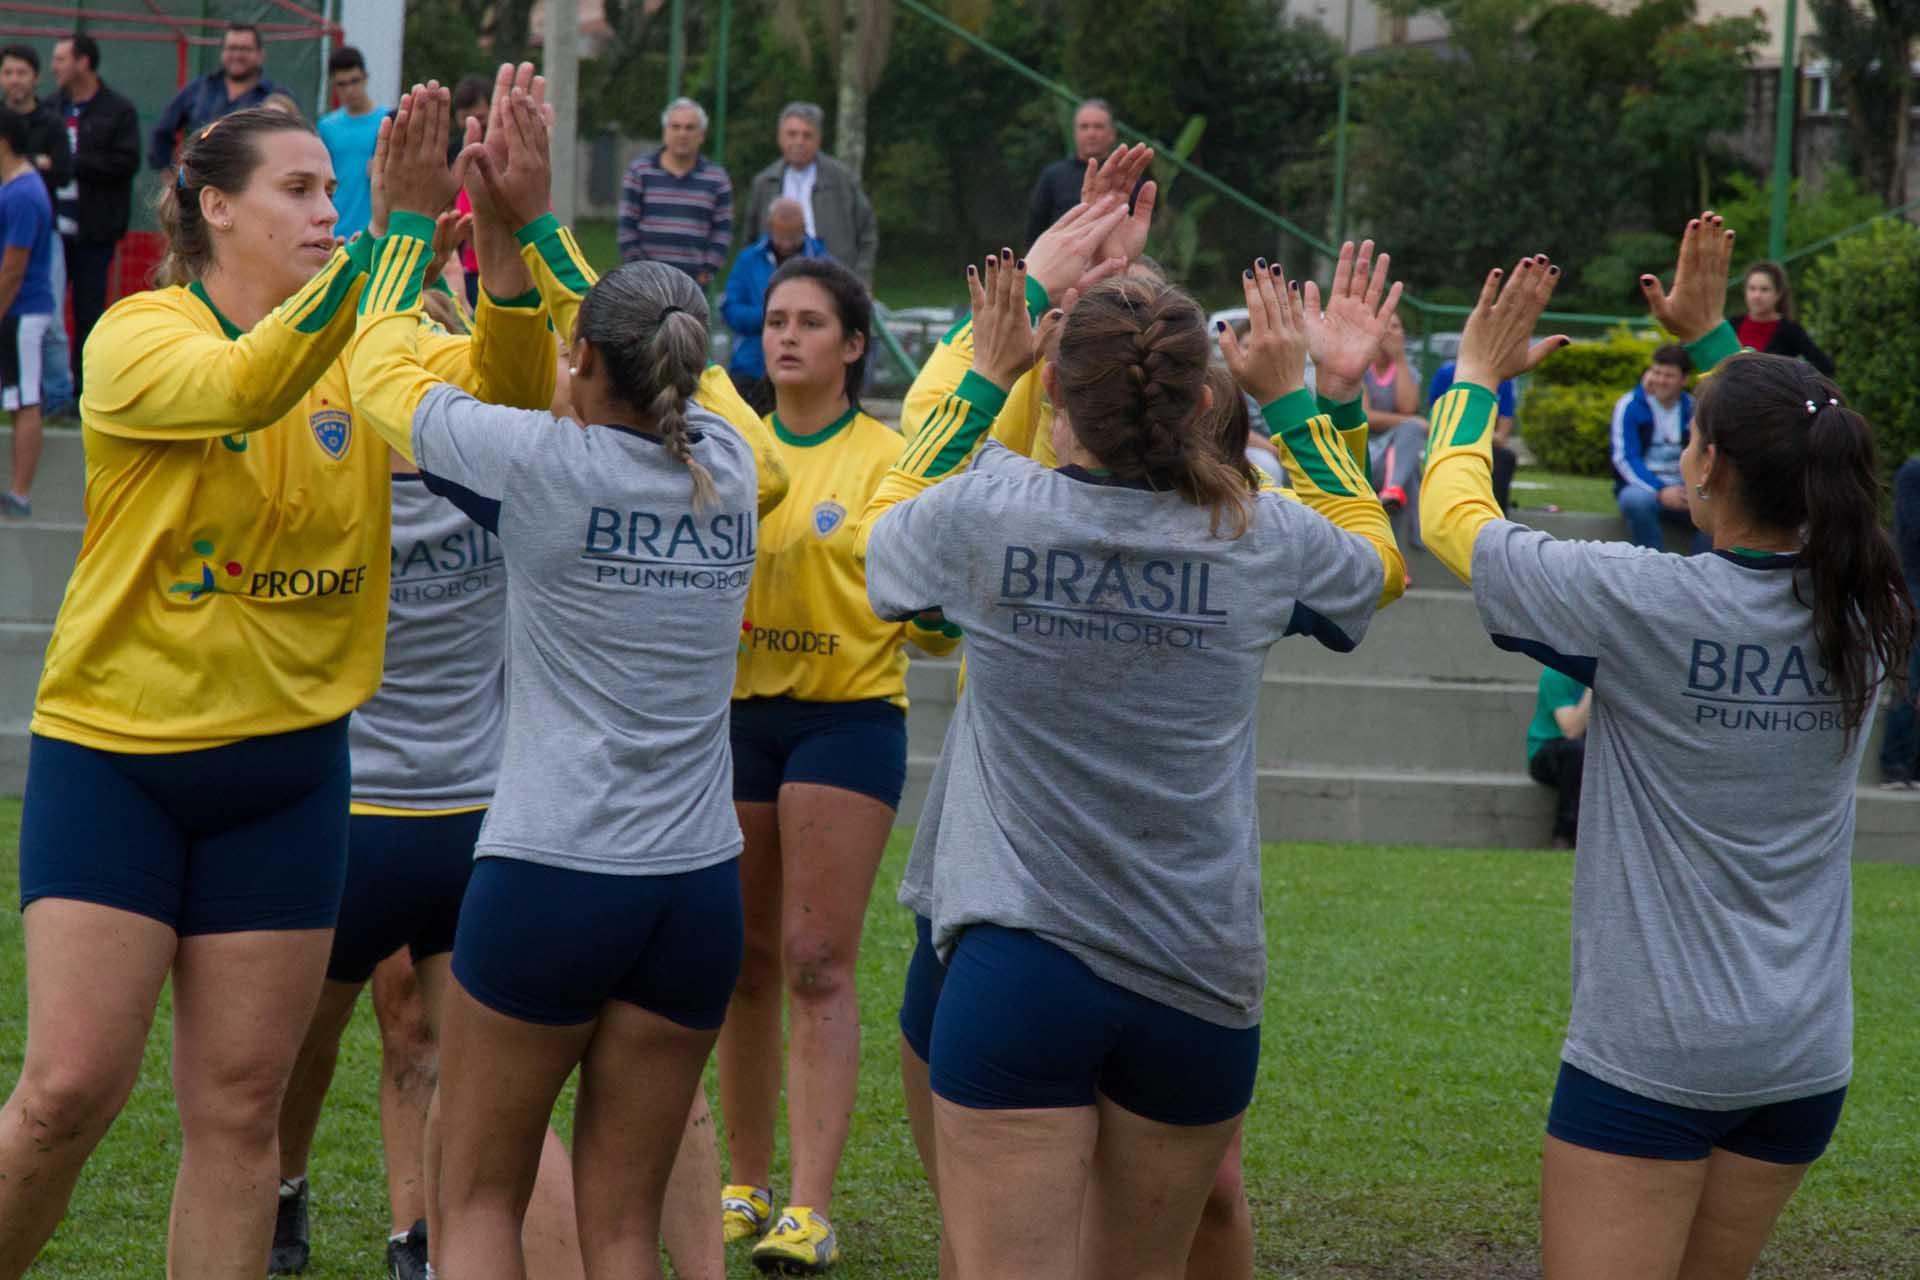 Brasilien bejubelt den Auftaktsieg (Foto: Spille)